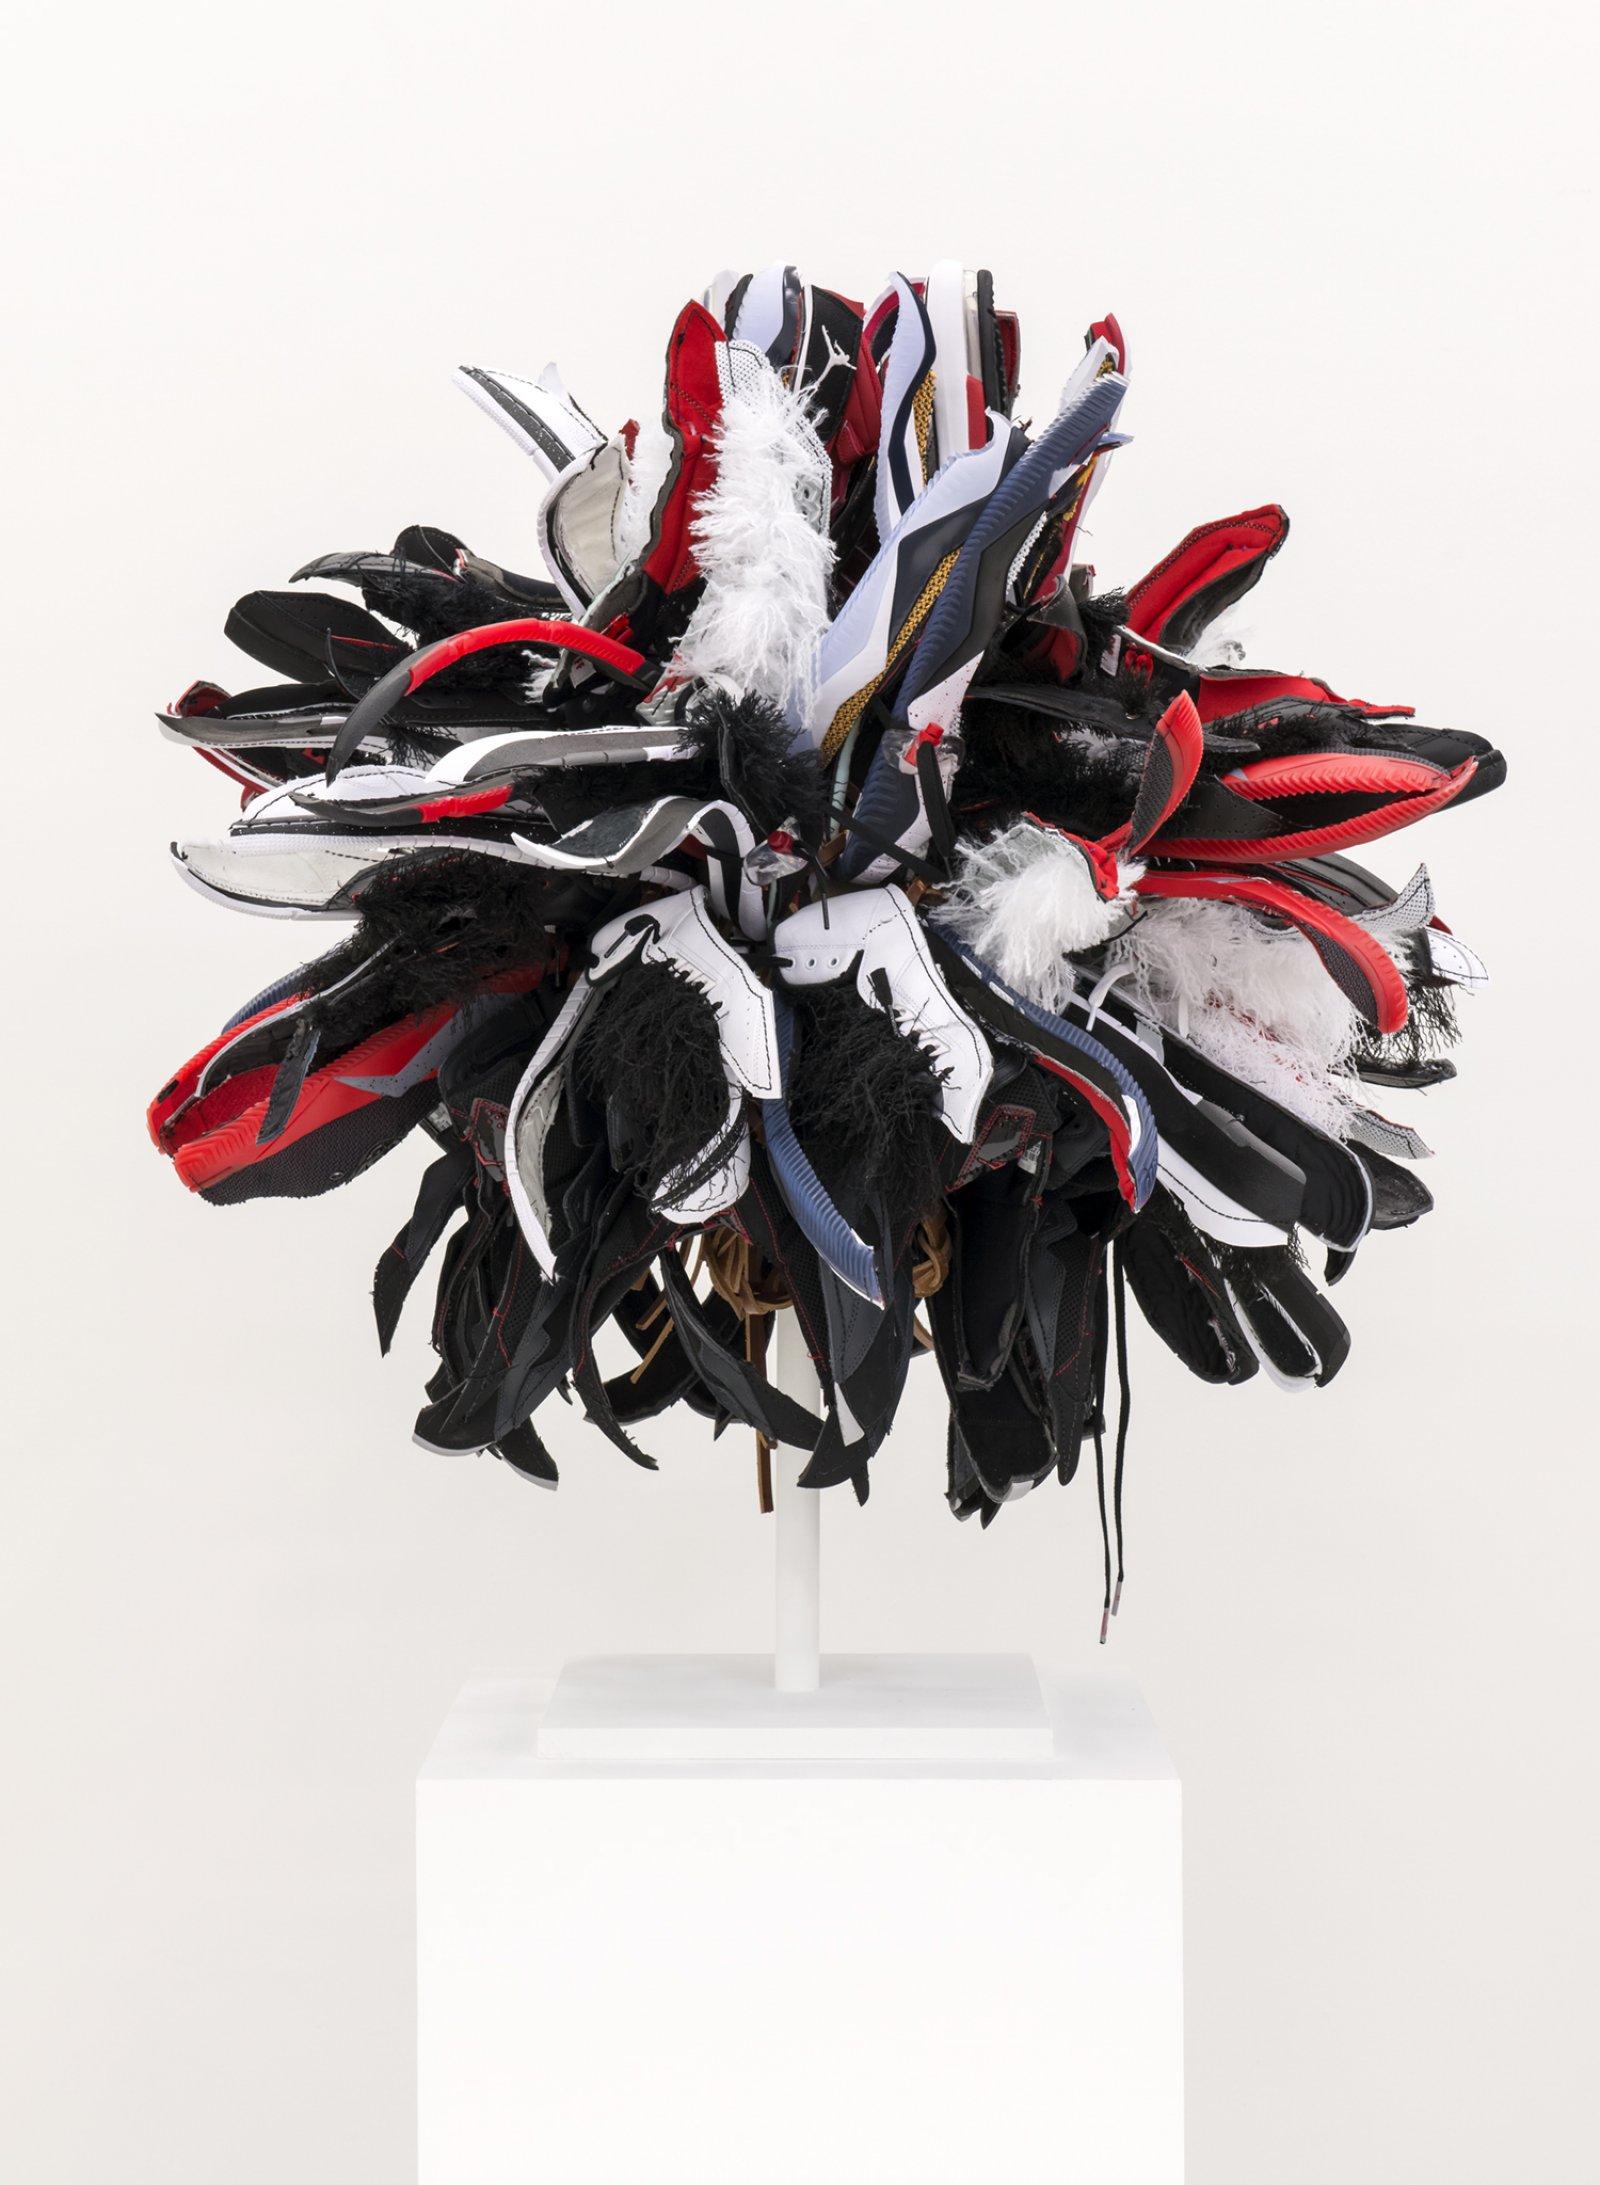 Brian Jungen,Warrior 3, 2018, nike air jordans, leather, copper, 33 x 30 x 32 in. (84 x 76 x 81 cm)